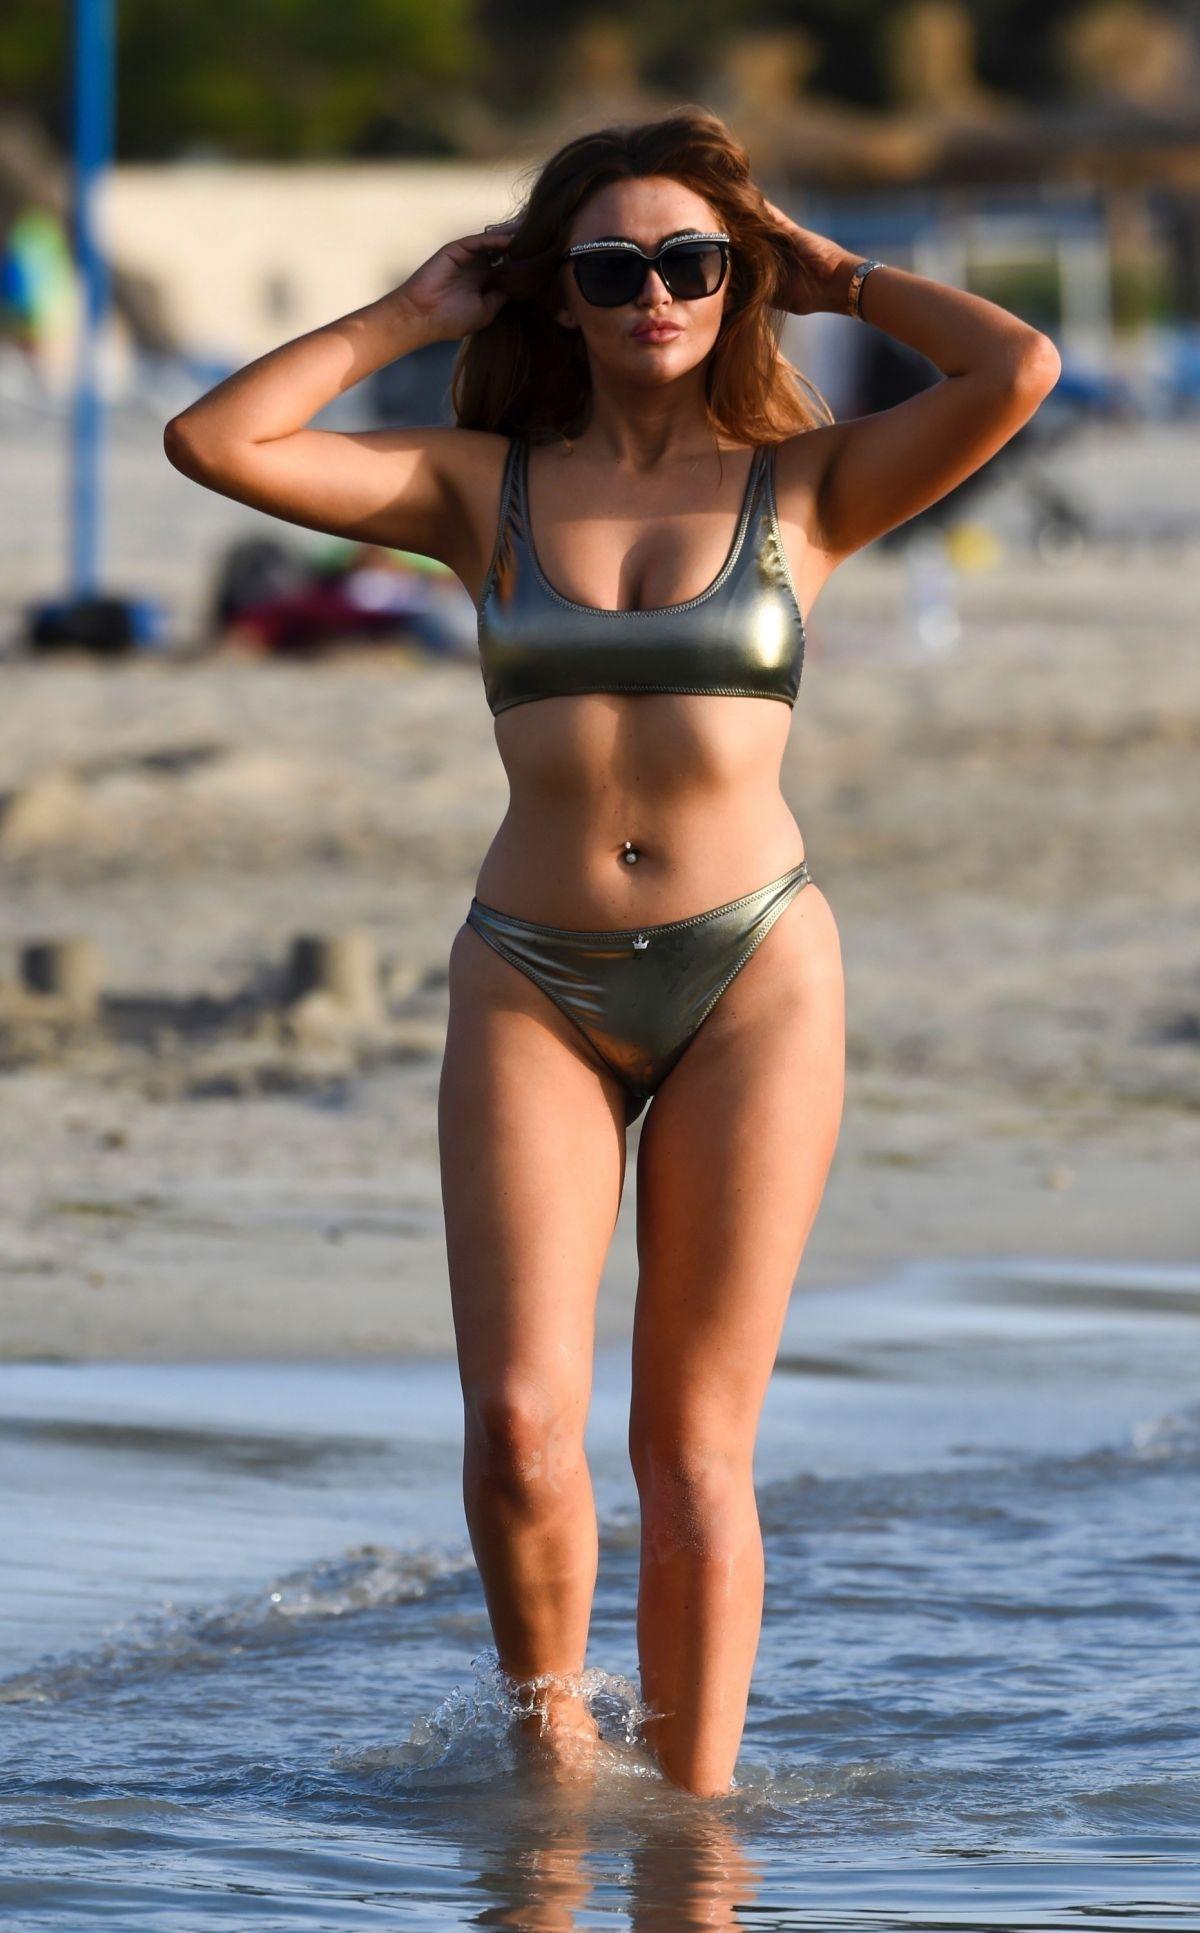 Hot Charlotte Dawson nudes (55 photos), Tits, Hot, Selfie, legs 2015